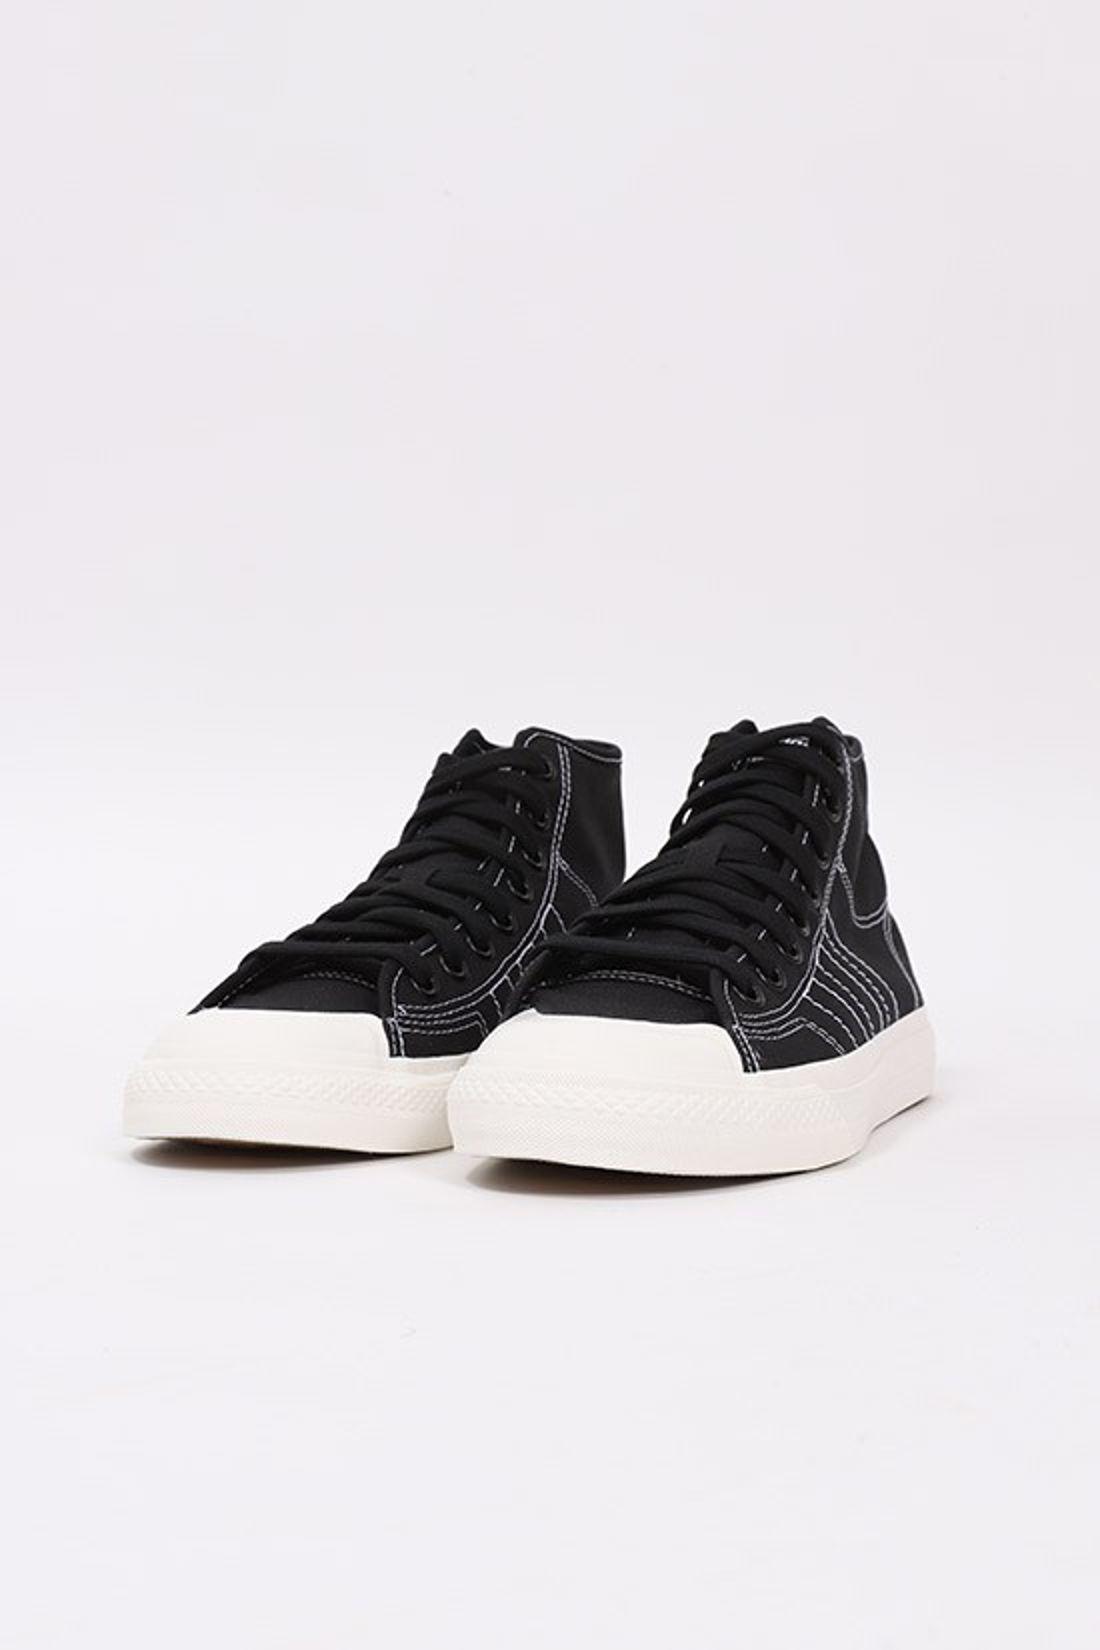 ADIDAS / Nizza hi rf Black/white